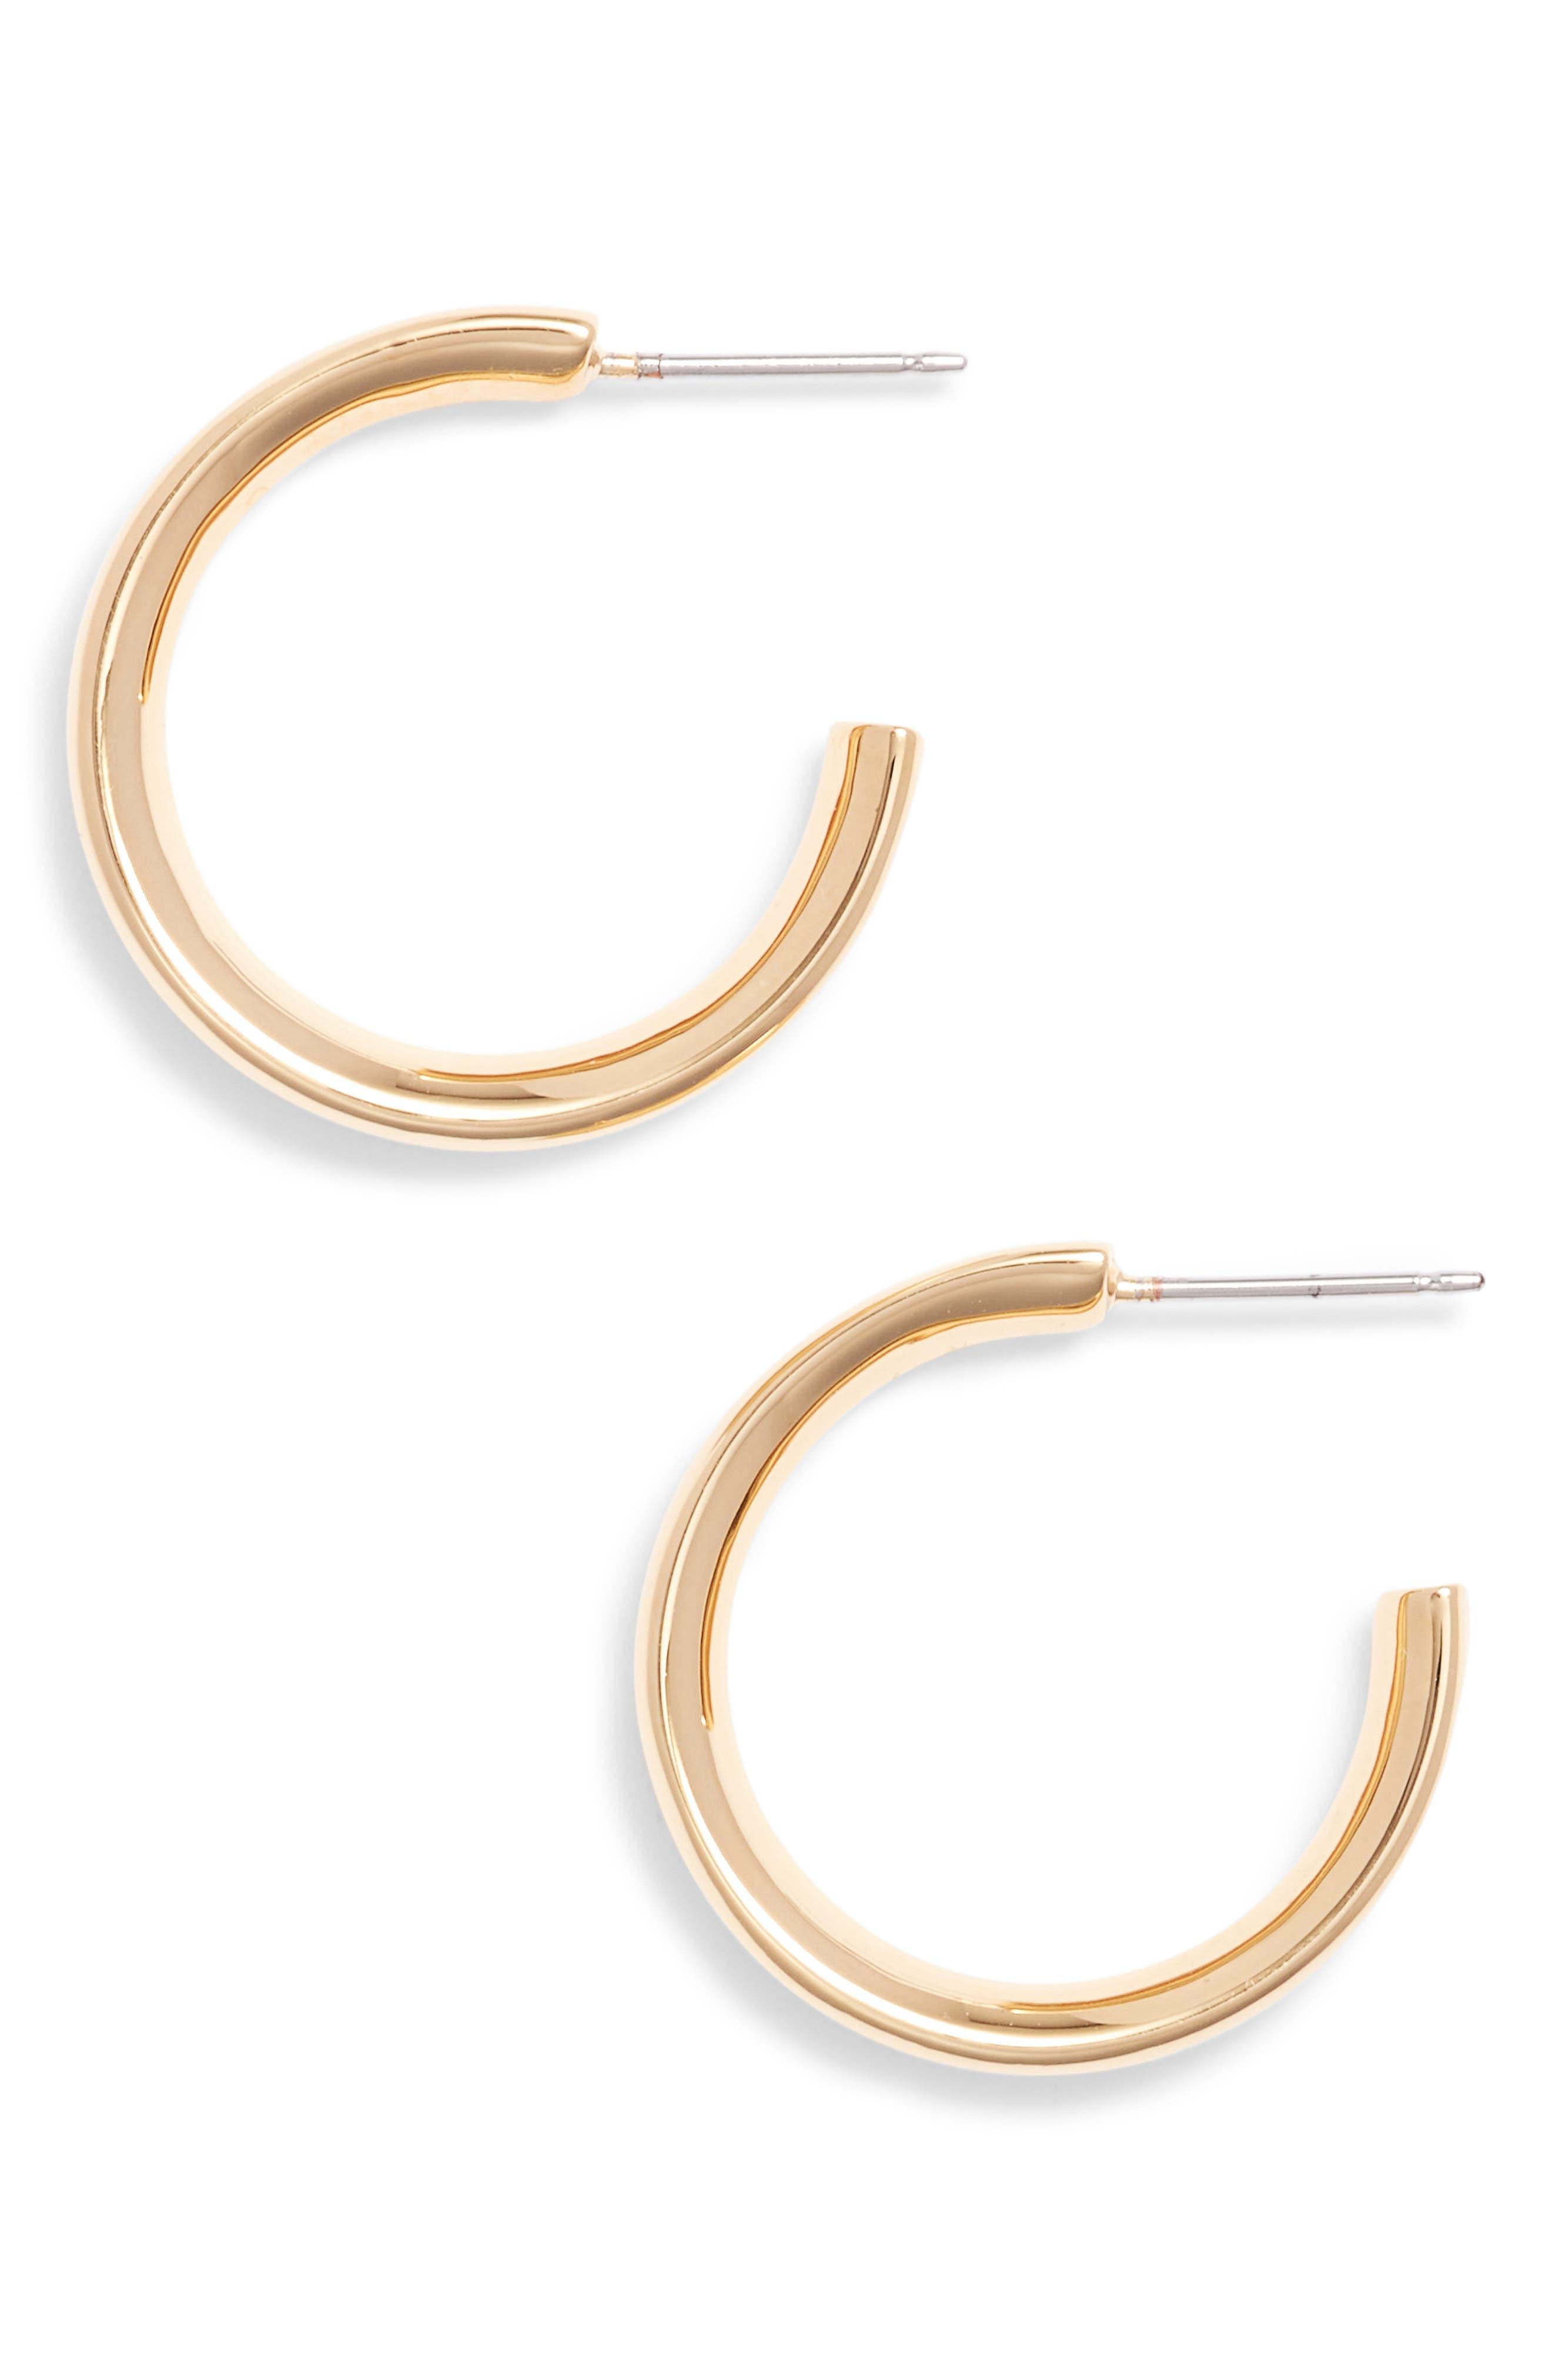 Stella Valle Heart Shaped Hoop Earrings